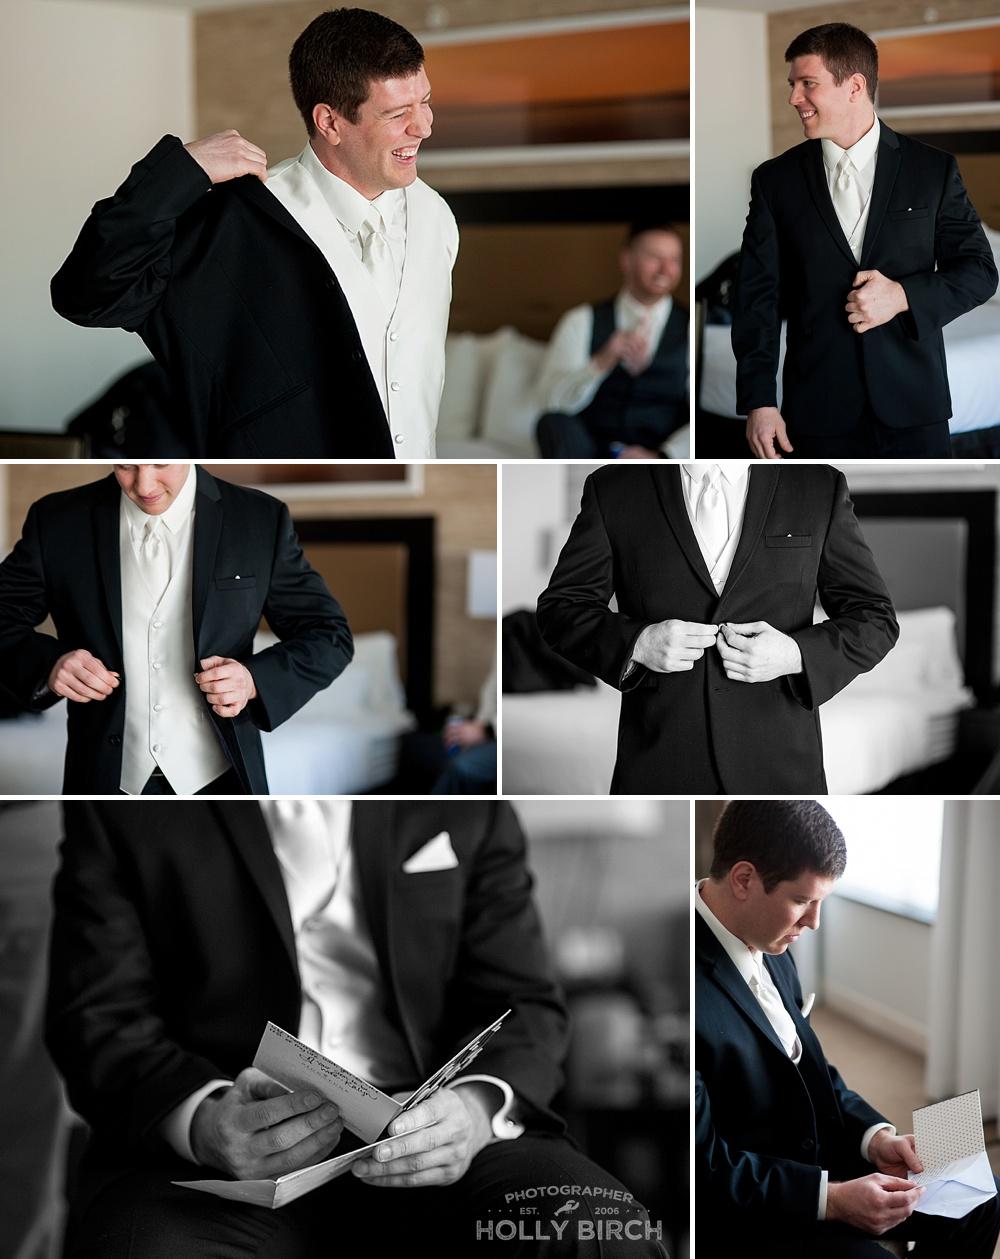 Bloomington-Normal-wedding-Holiday-Inn-airport-wedding_3116.jpg